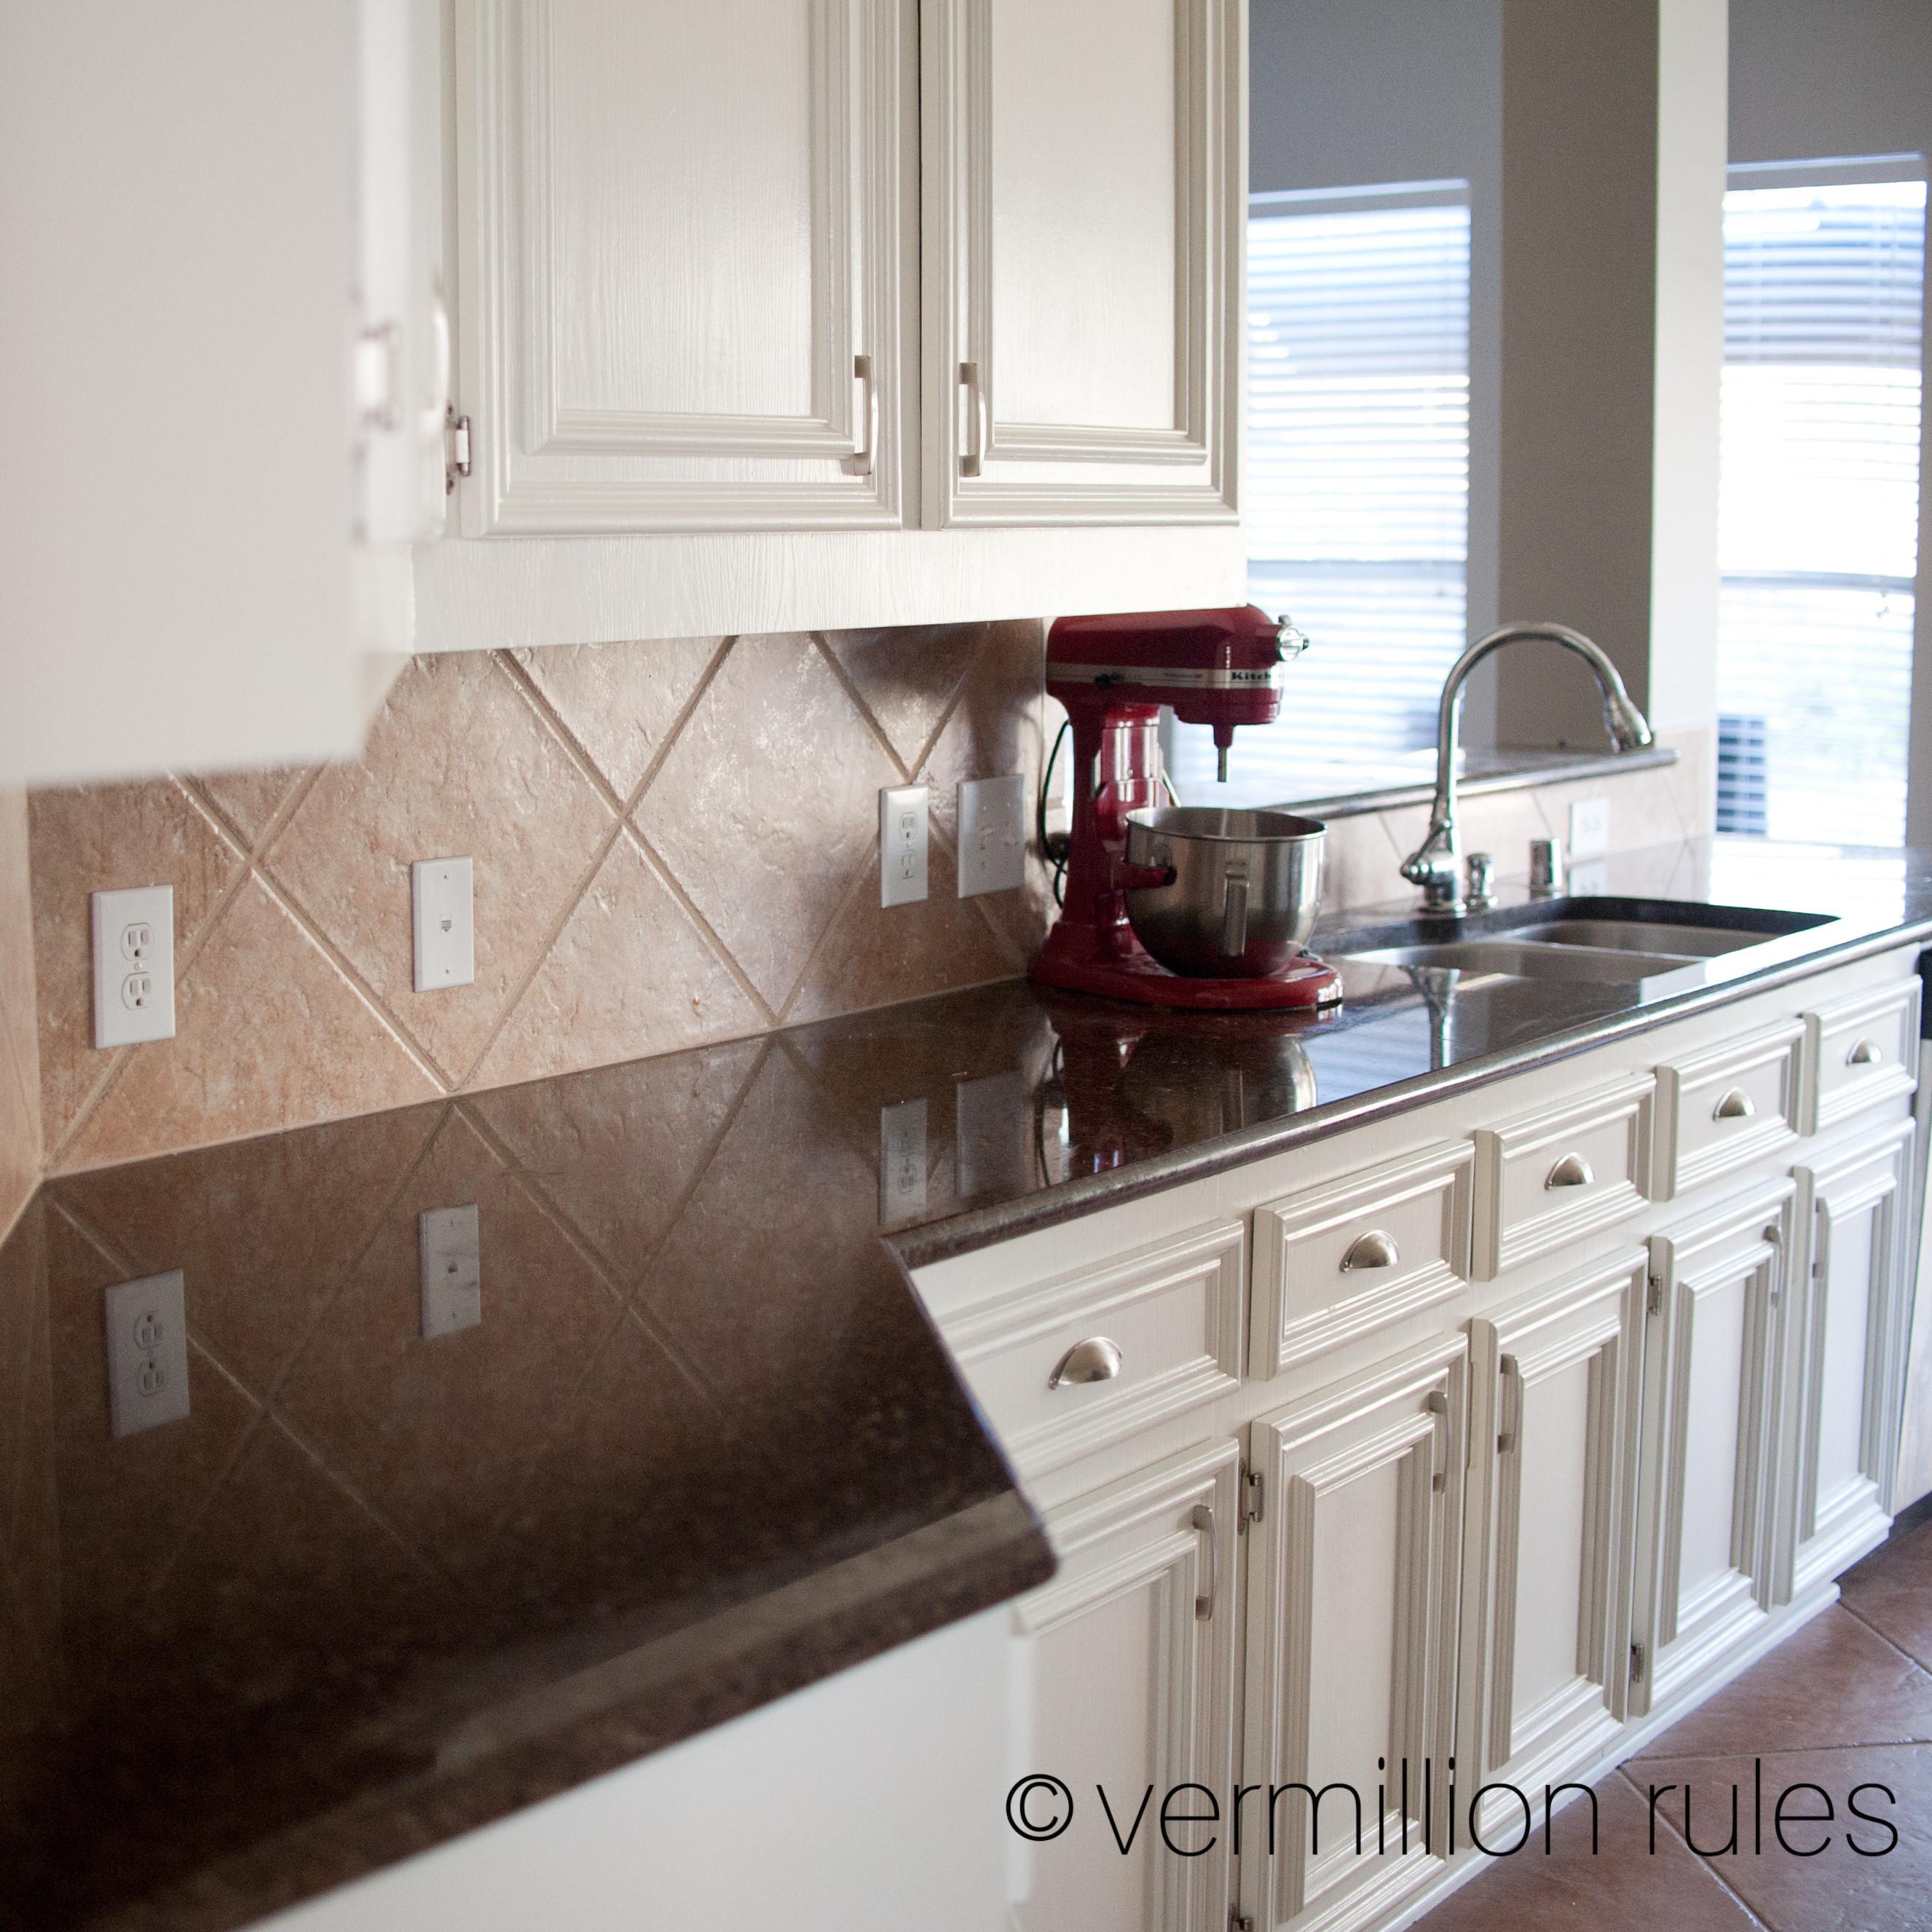 Best ideas about DIY Kitchen Cabinets Paint . Save or Pin A DIY Project Painting Kitchen Cabinets Now.